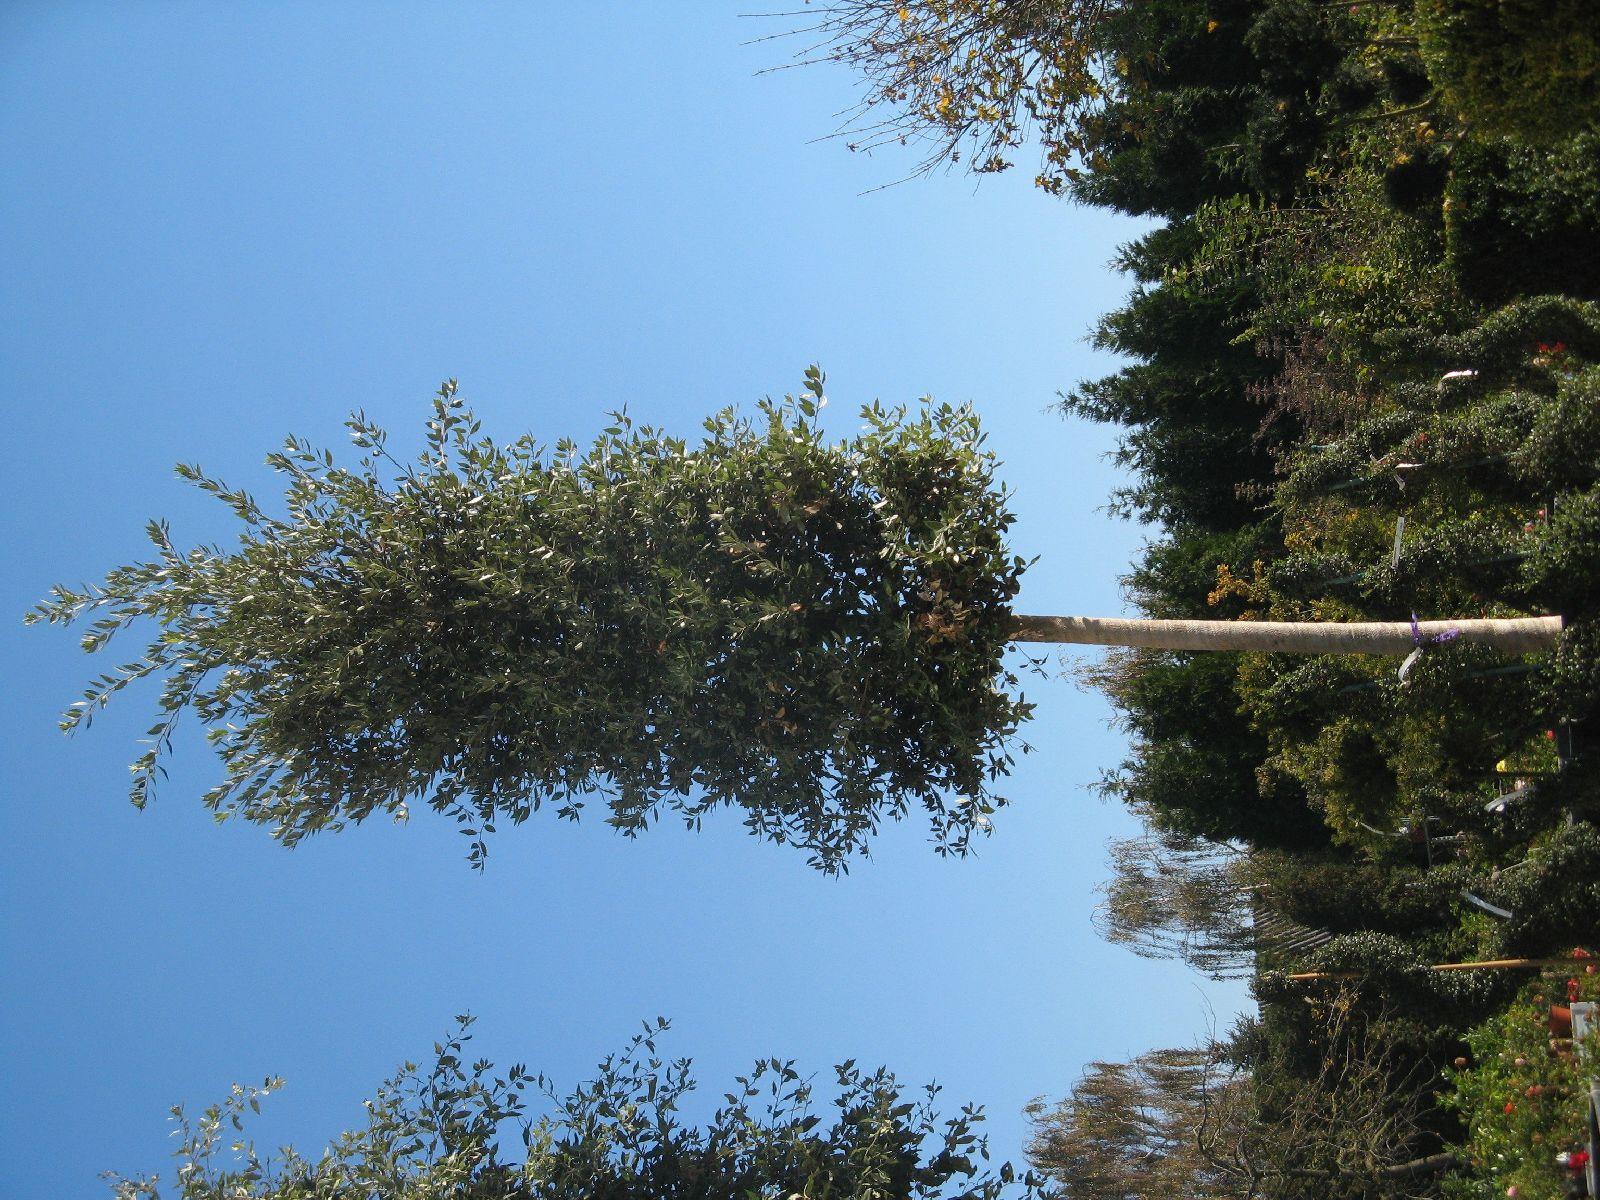 Plants-Trees_Photo_Texture_B_3740